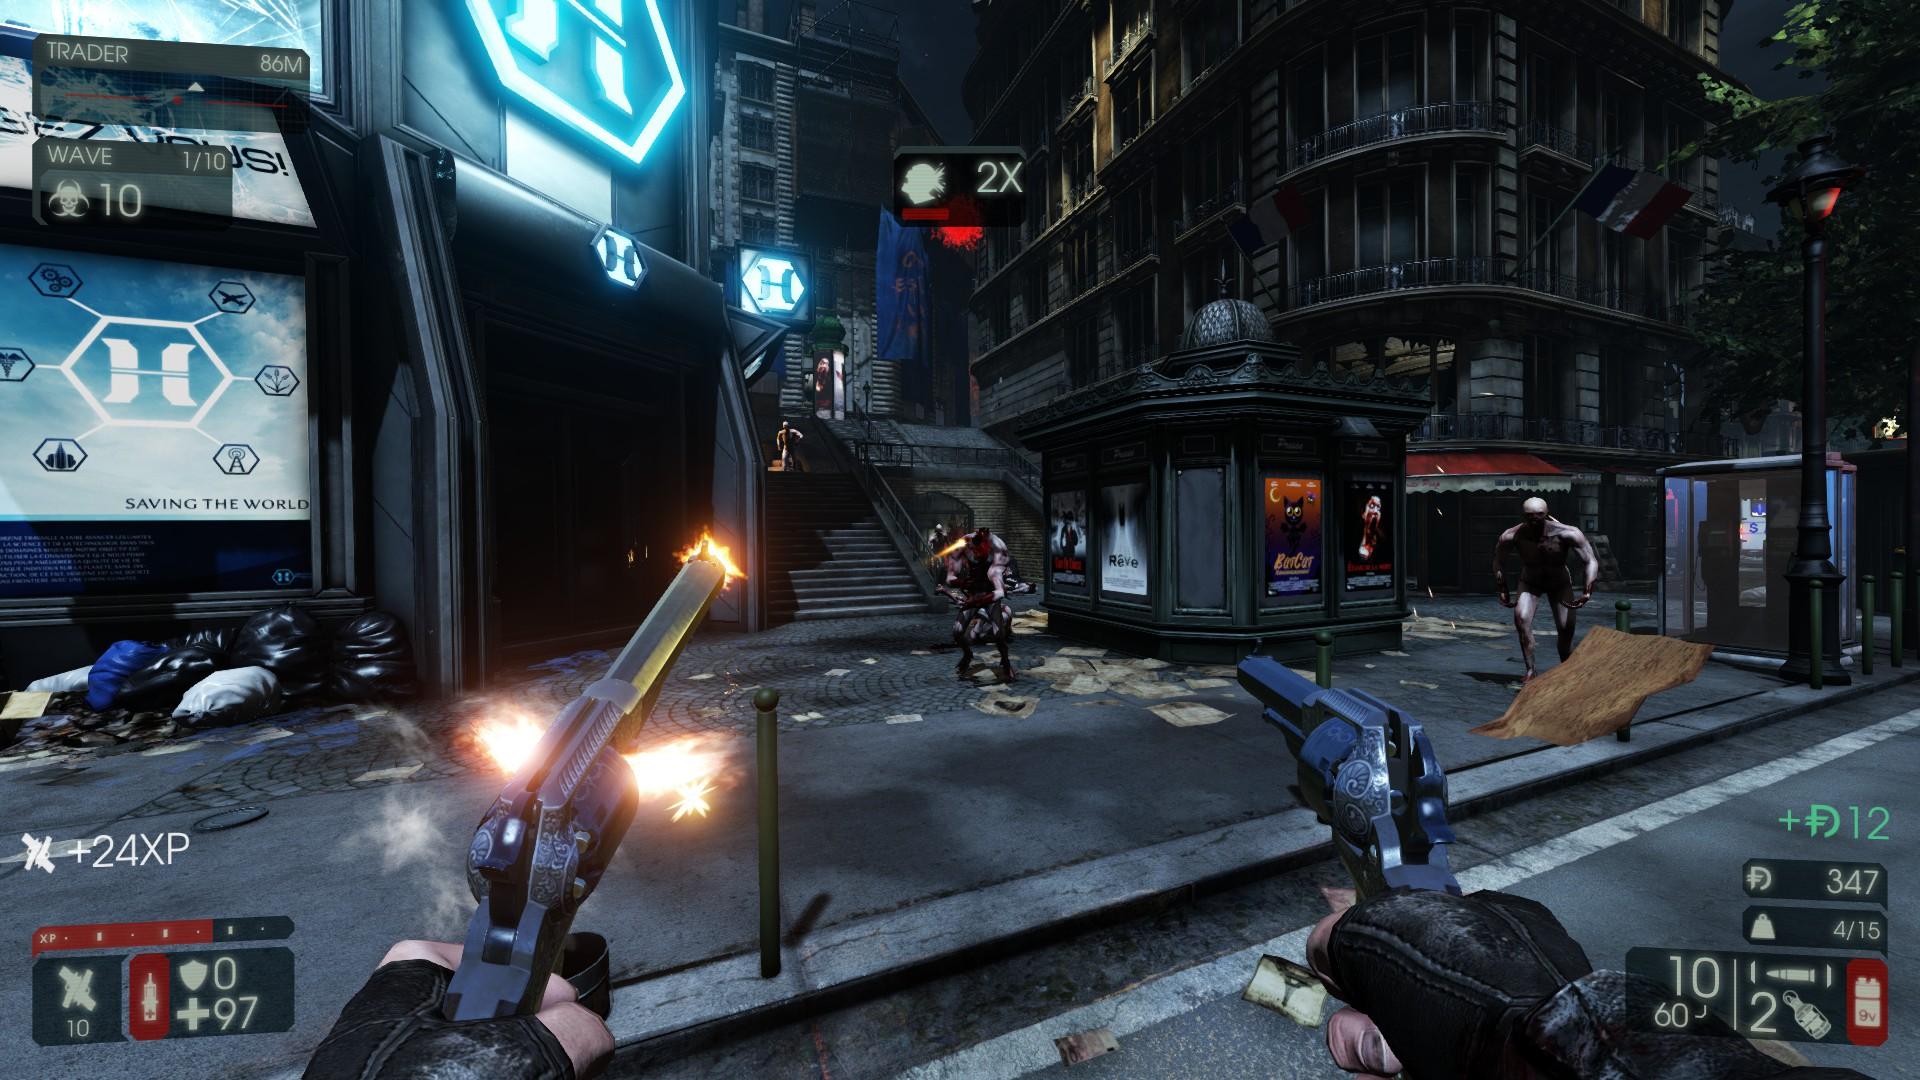 (Killing Floor 2, Tripwire Interactive)